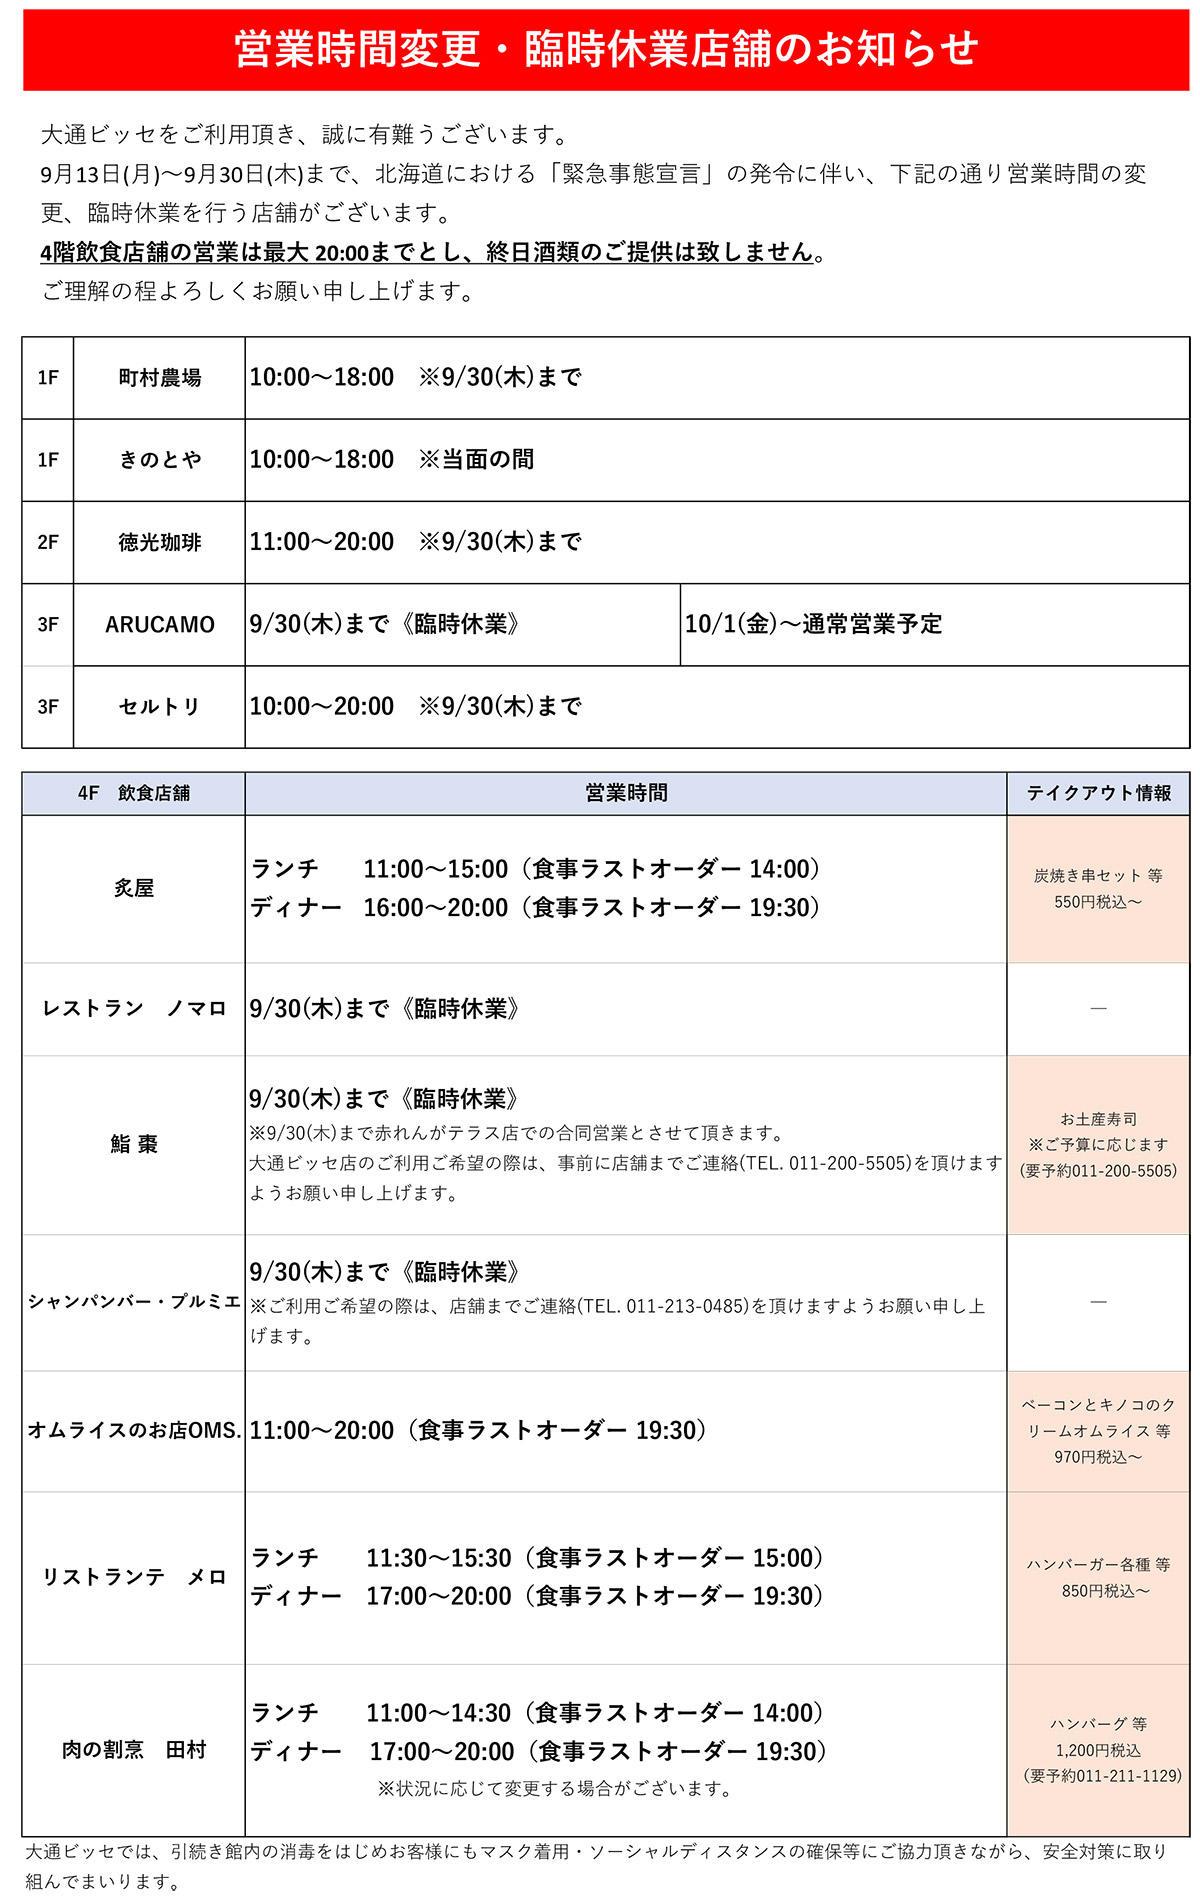 https://www.odori-bisse.com/info/news_210913_img.jpg